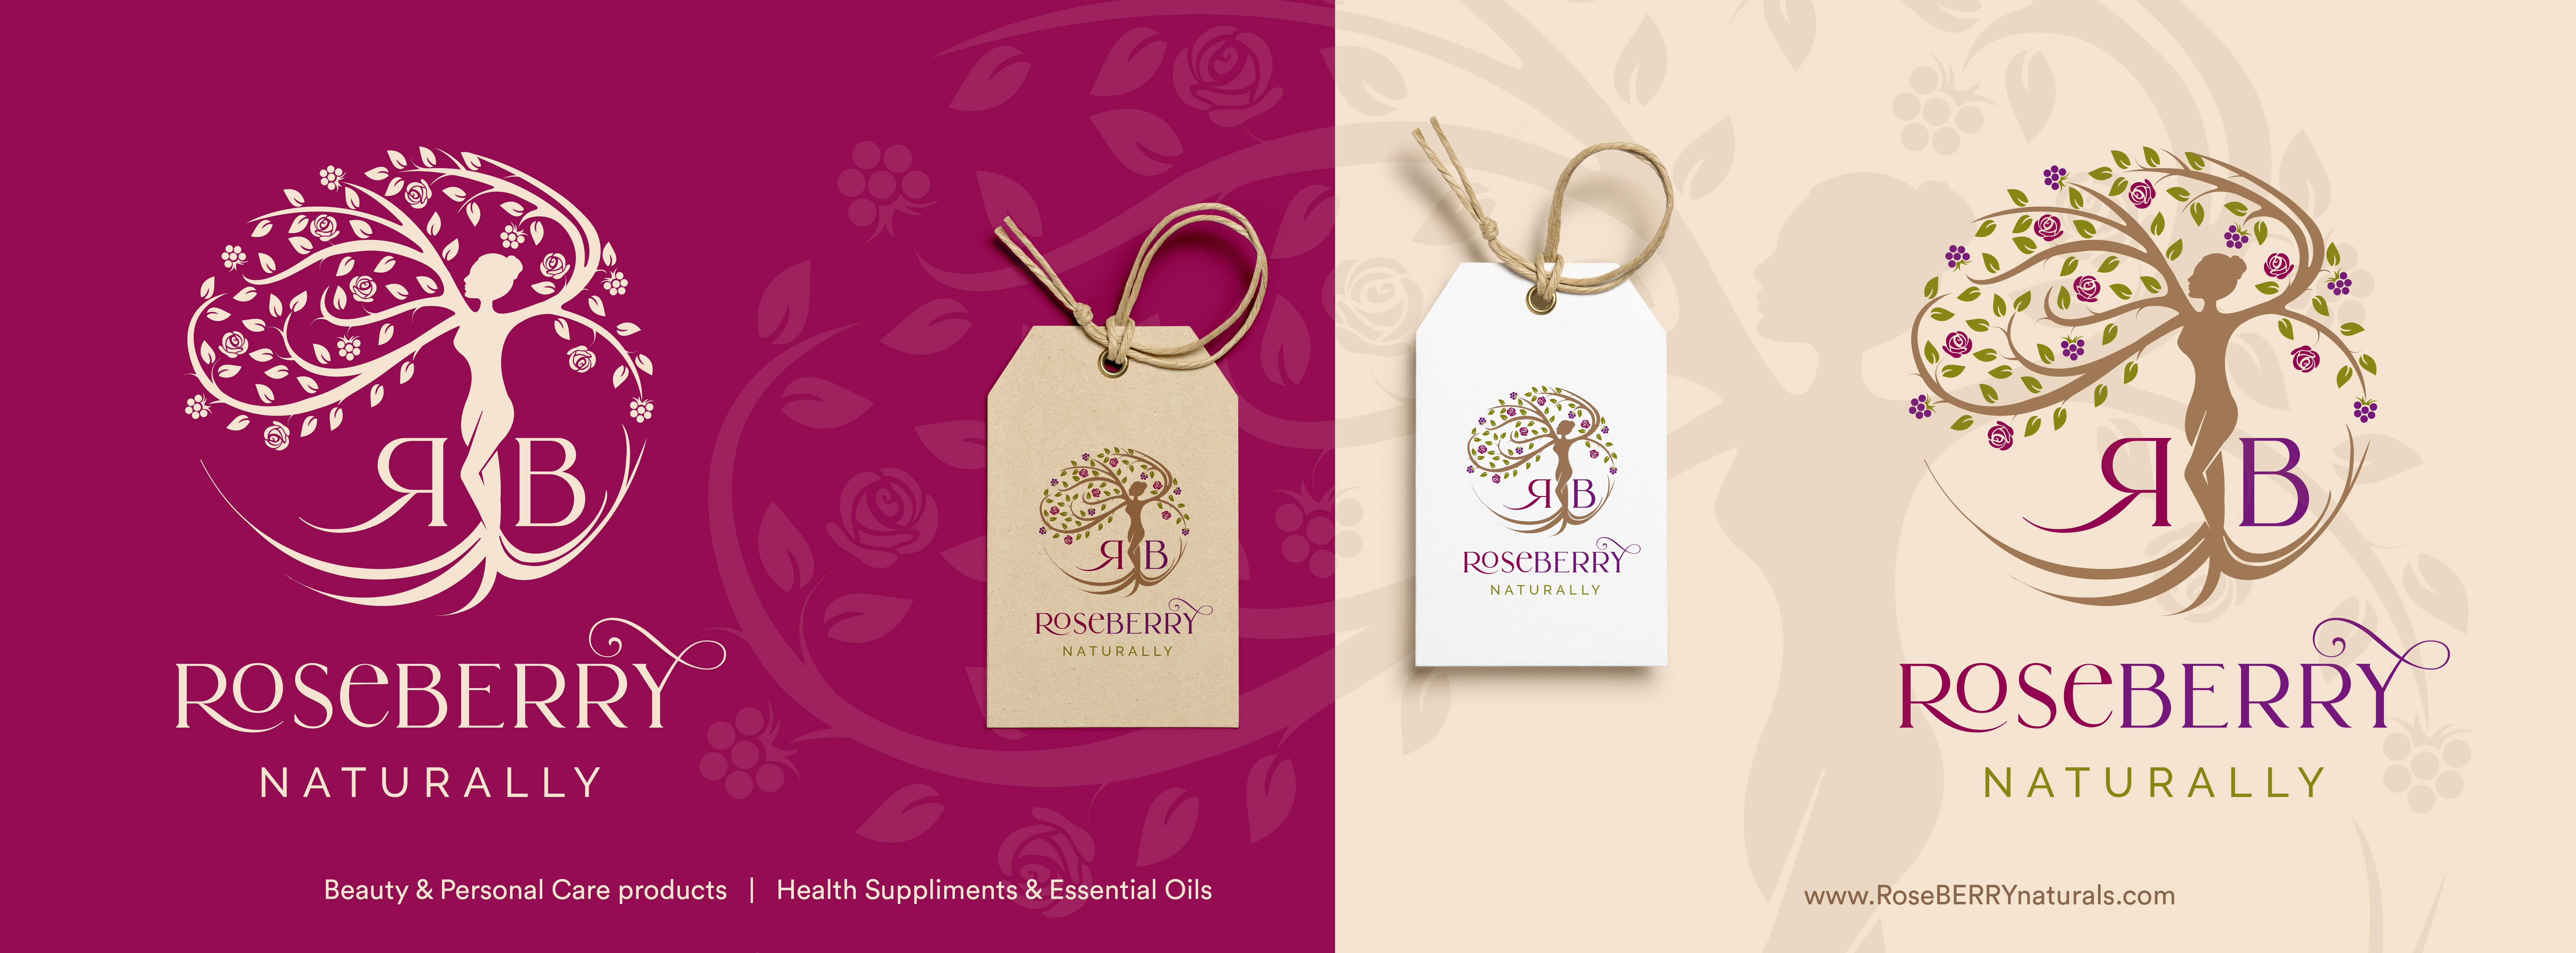 Product Logo & Branding